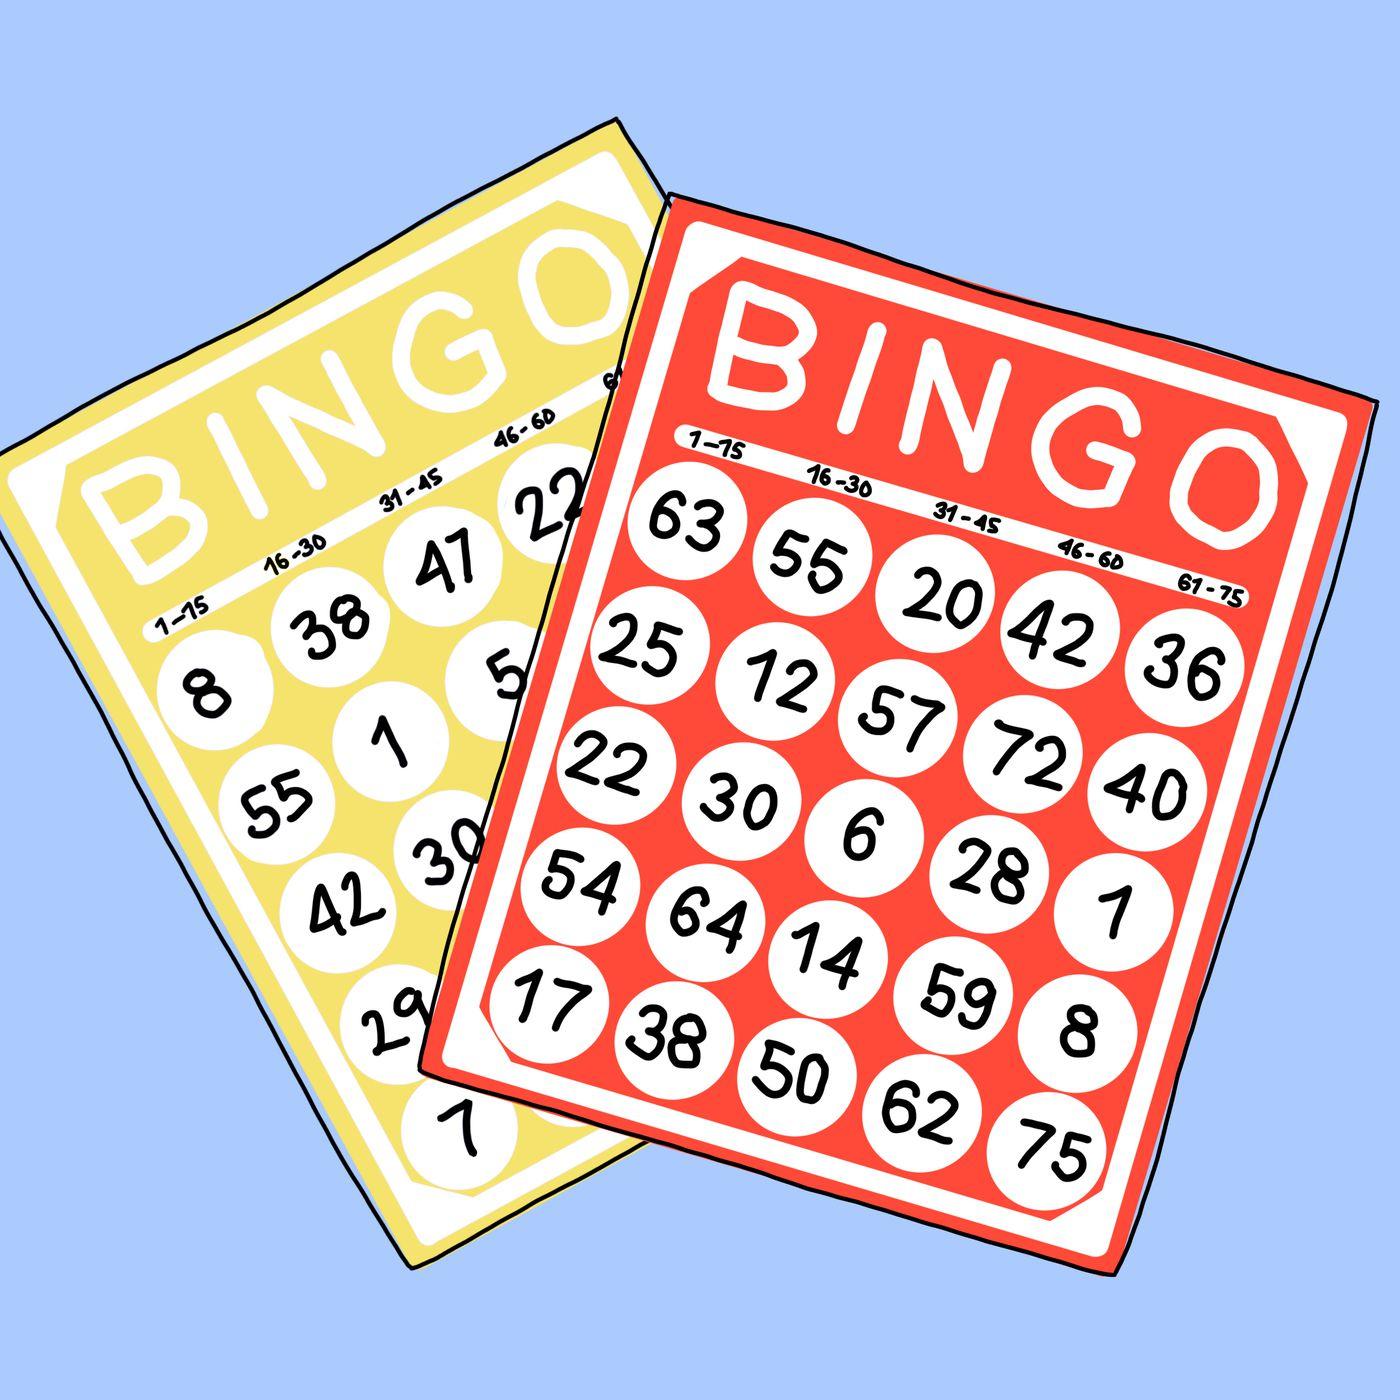 Bingo hall games: The best money Rachel Kramer Bussel ever.